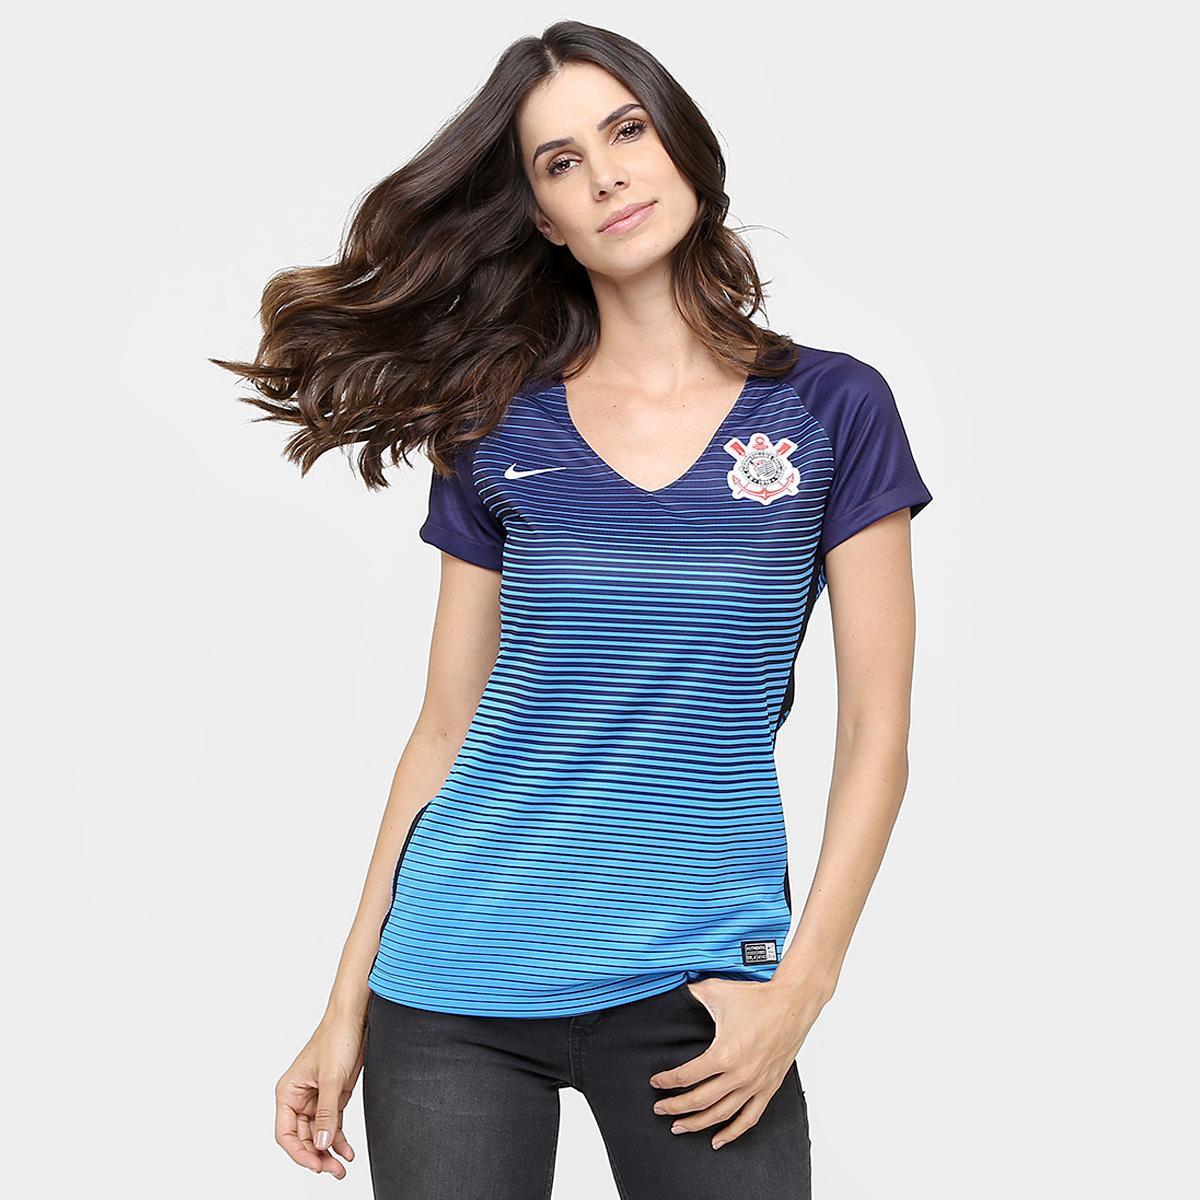 8a8628b3f97bf Camisa Corinthians III 2016 s nº Torcedor Nike Feminina - Compre Agora